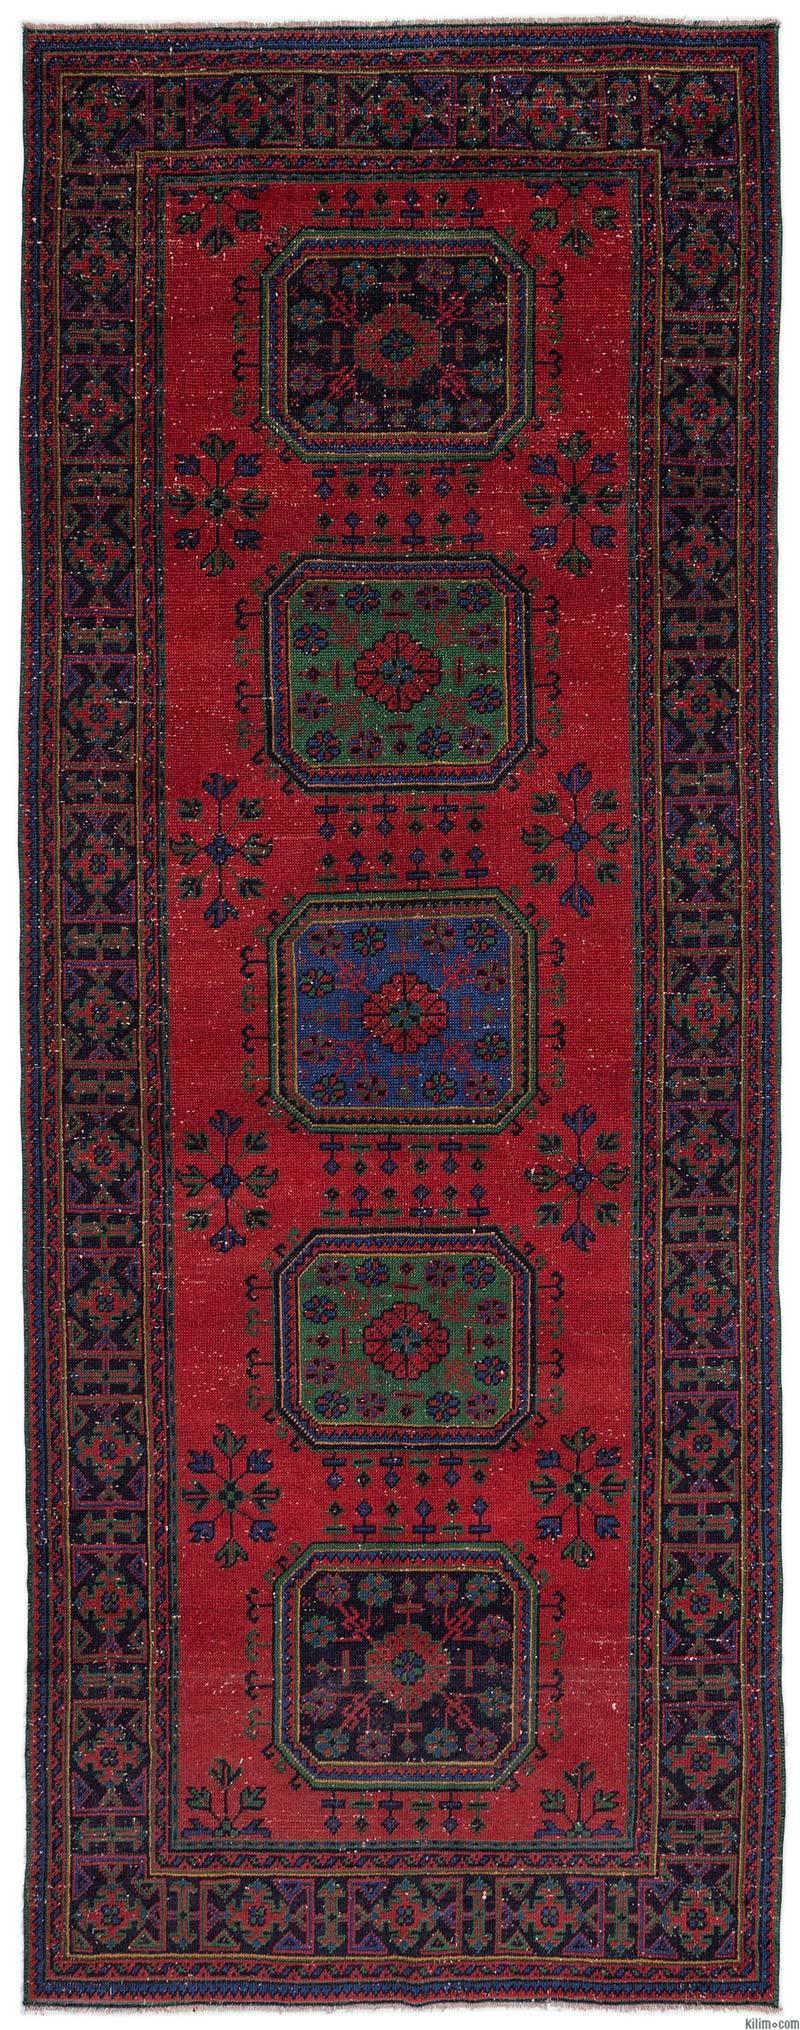 K0014025 Turkish Vintage Rug 439103939 X 1239103939 58 In X